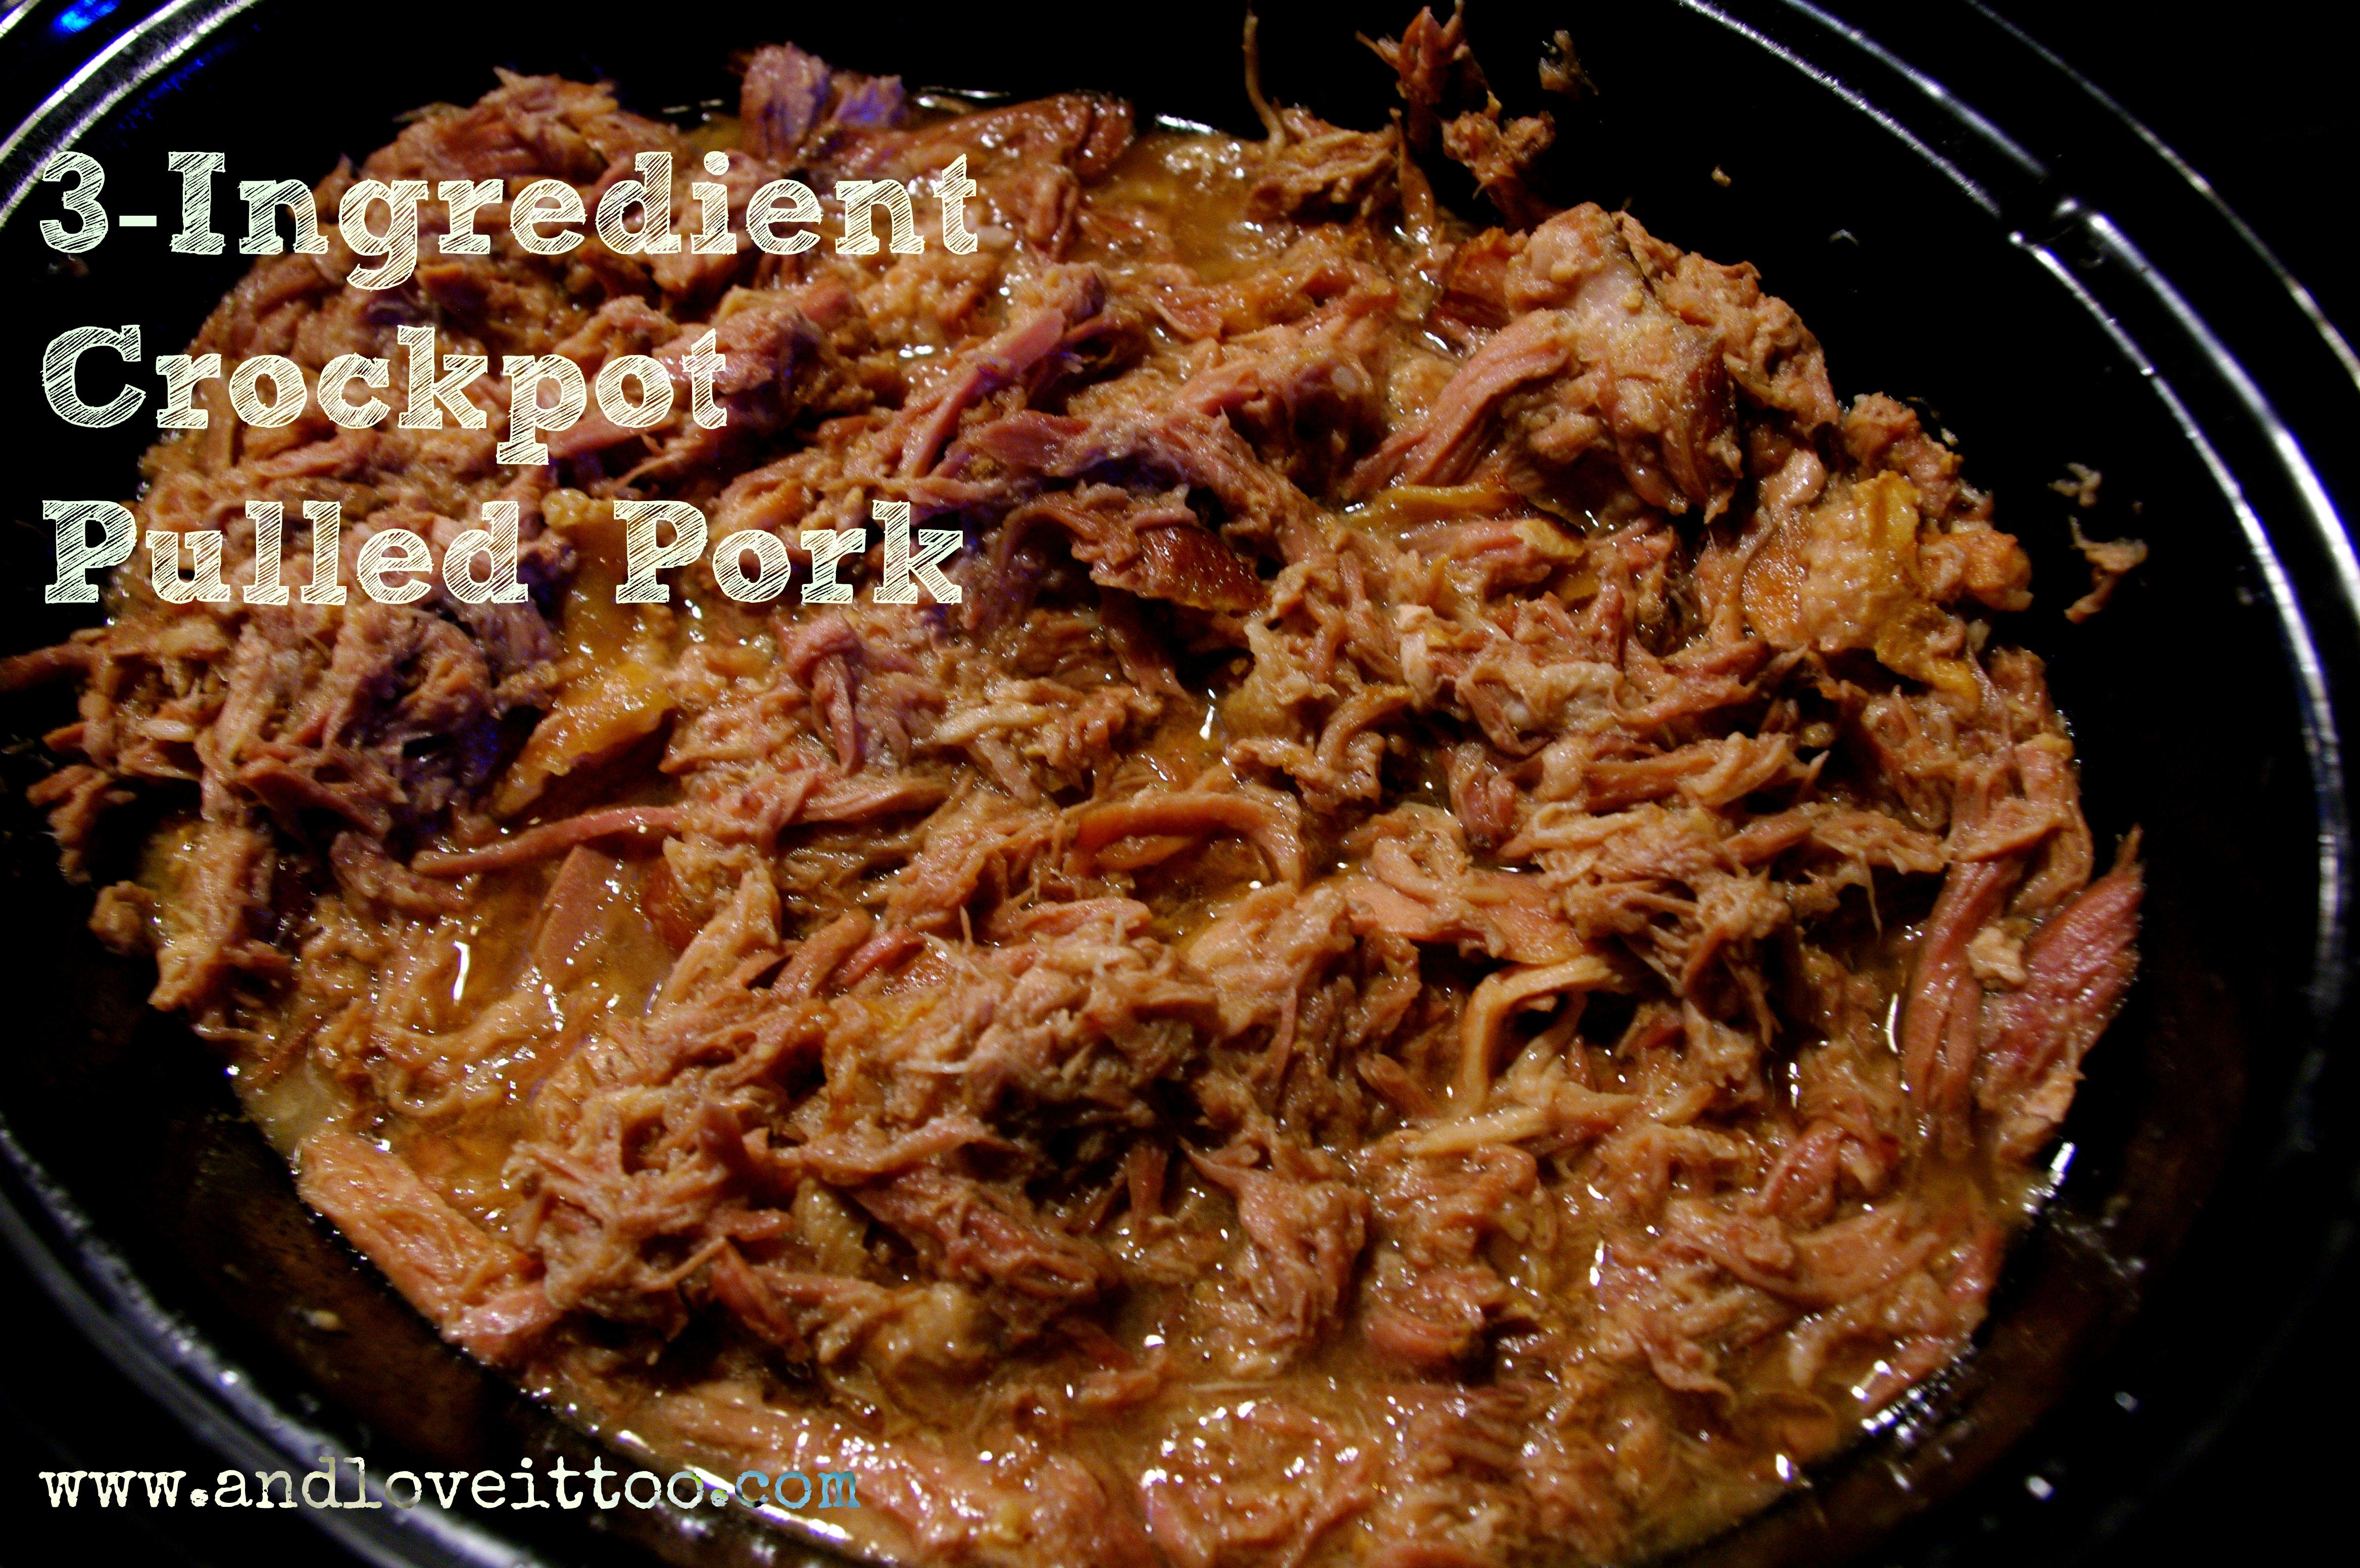 3-ingredient Crockpot Pulled Pork